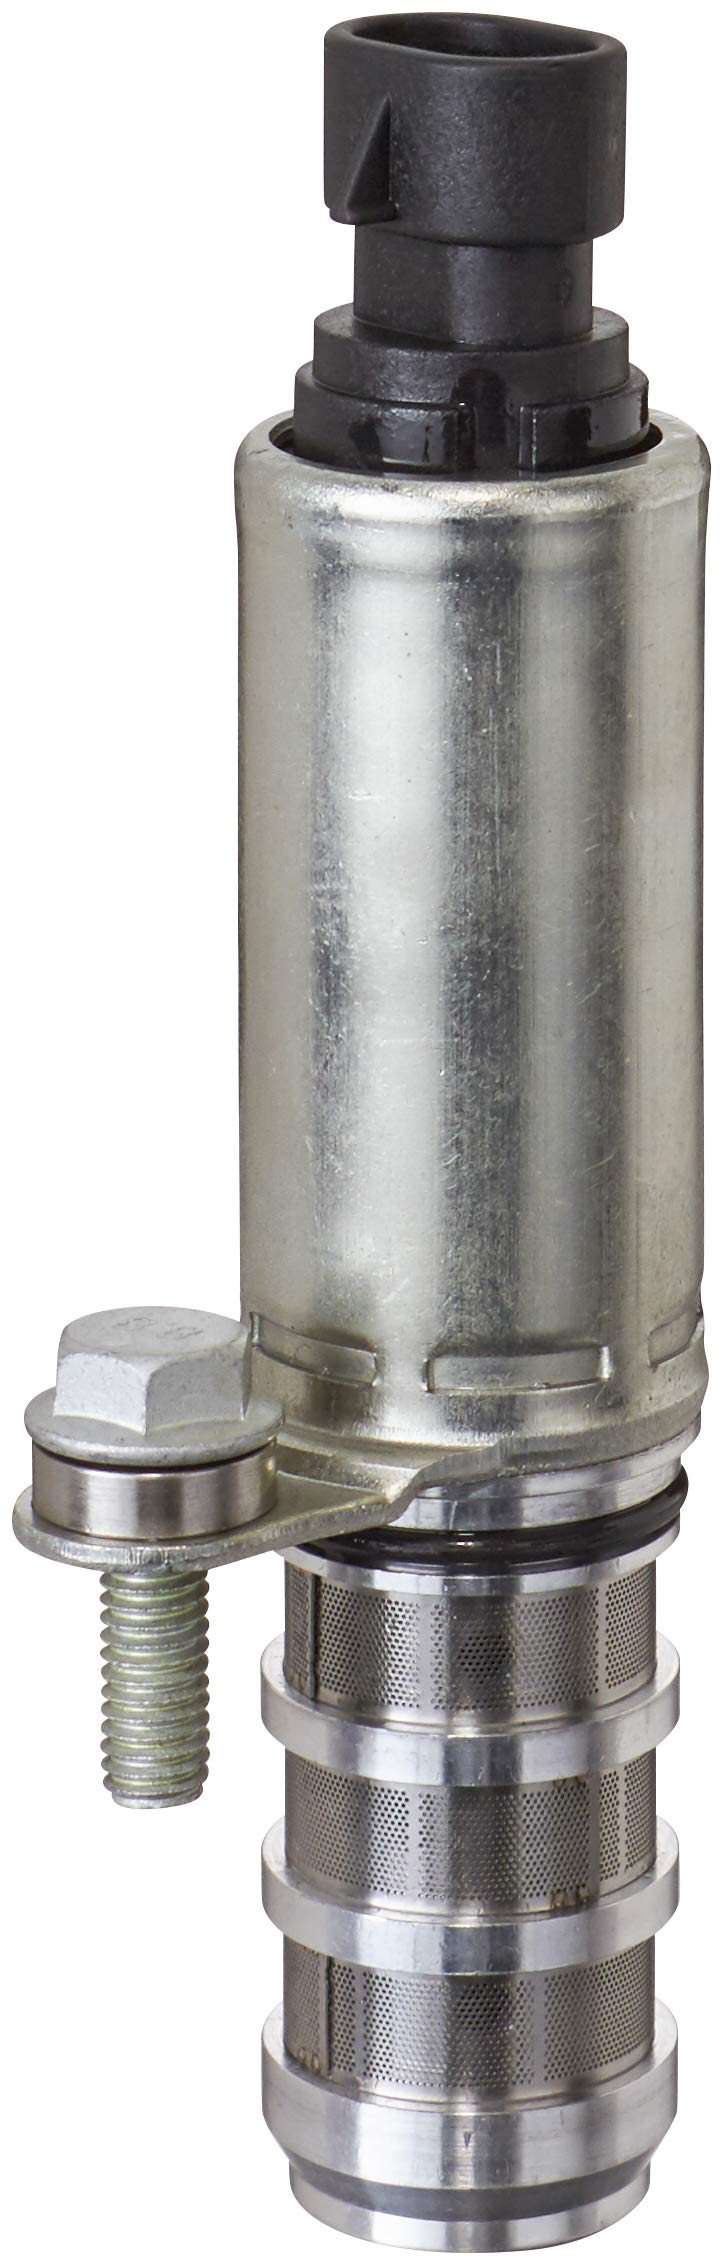 Spectra Premium VTS1003 Variable Valve Timing Solenoid